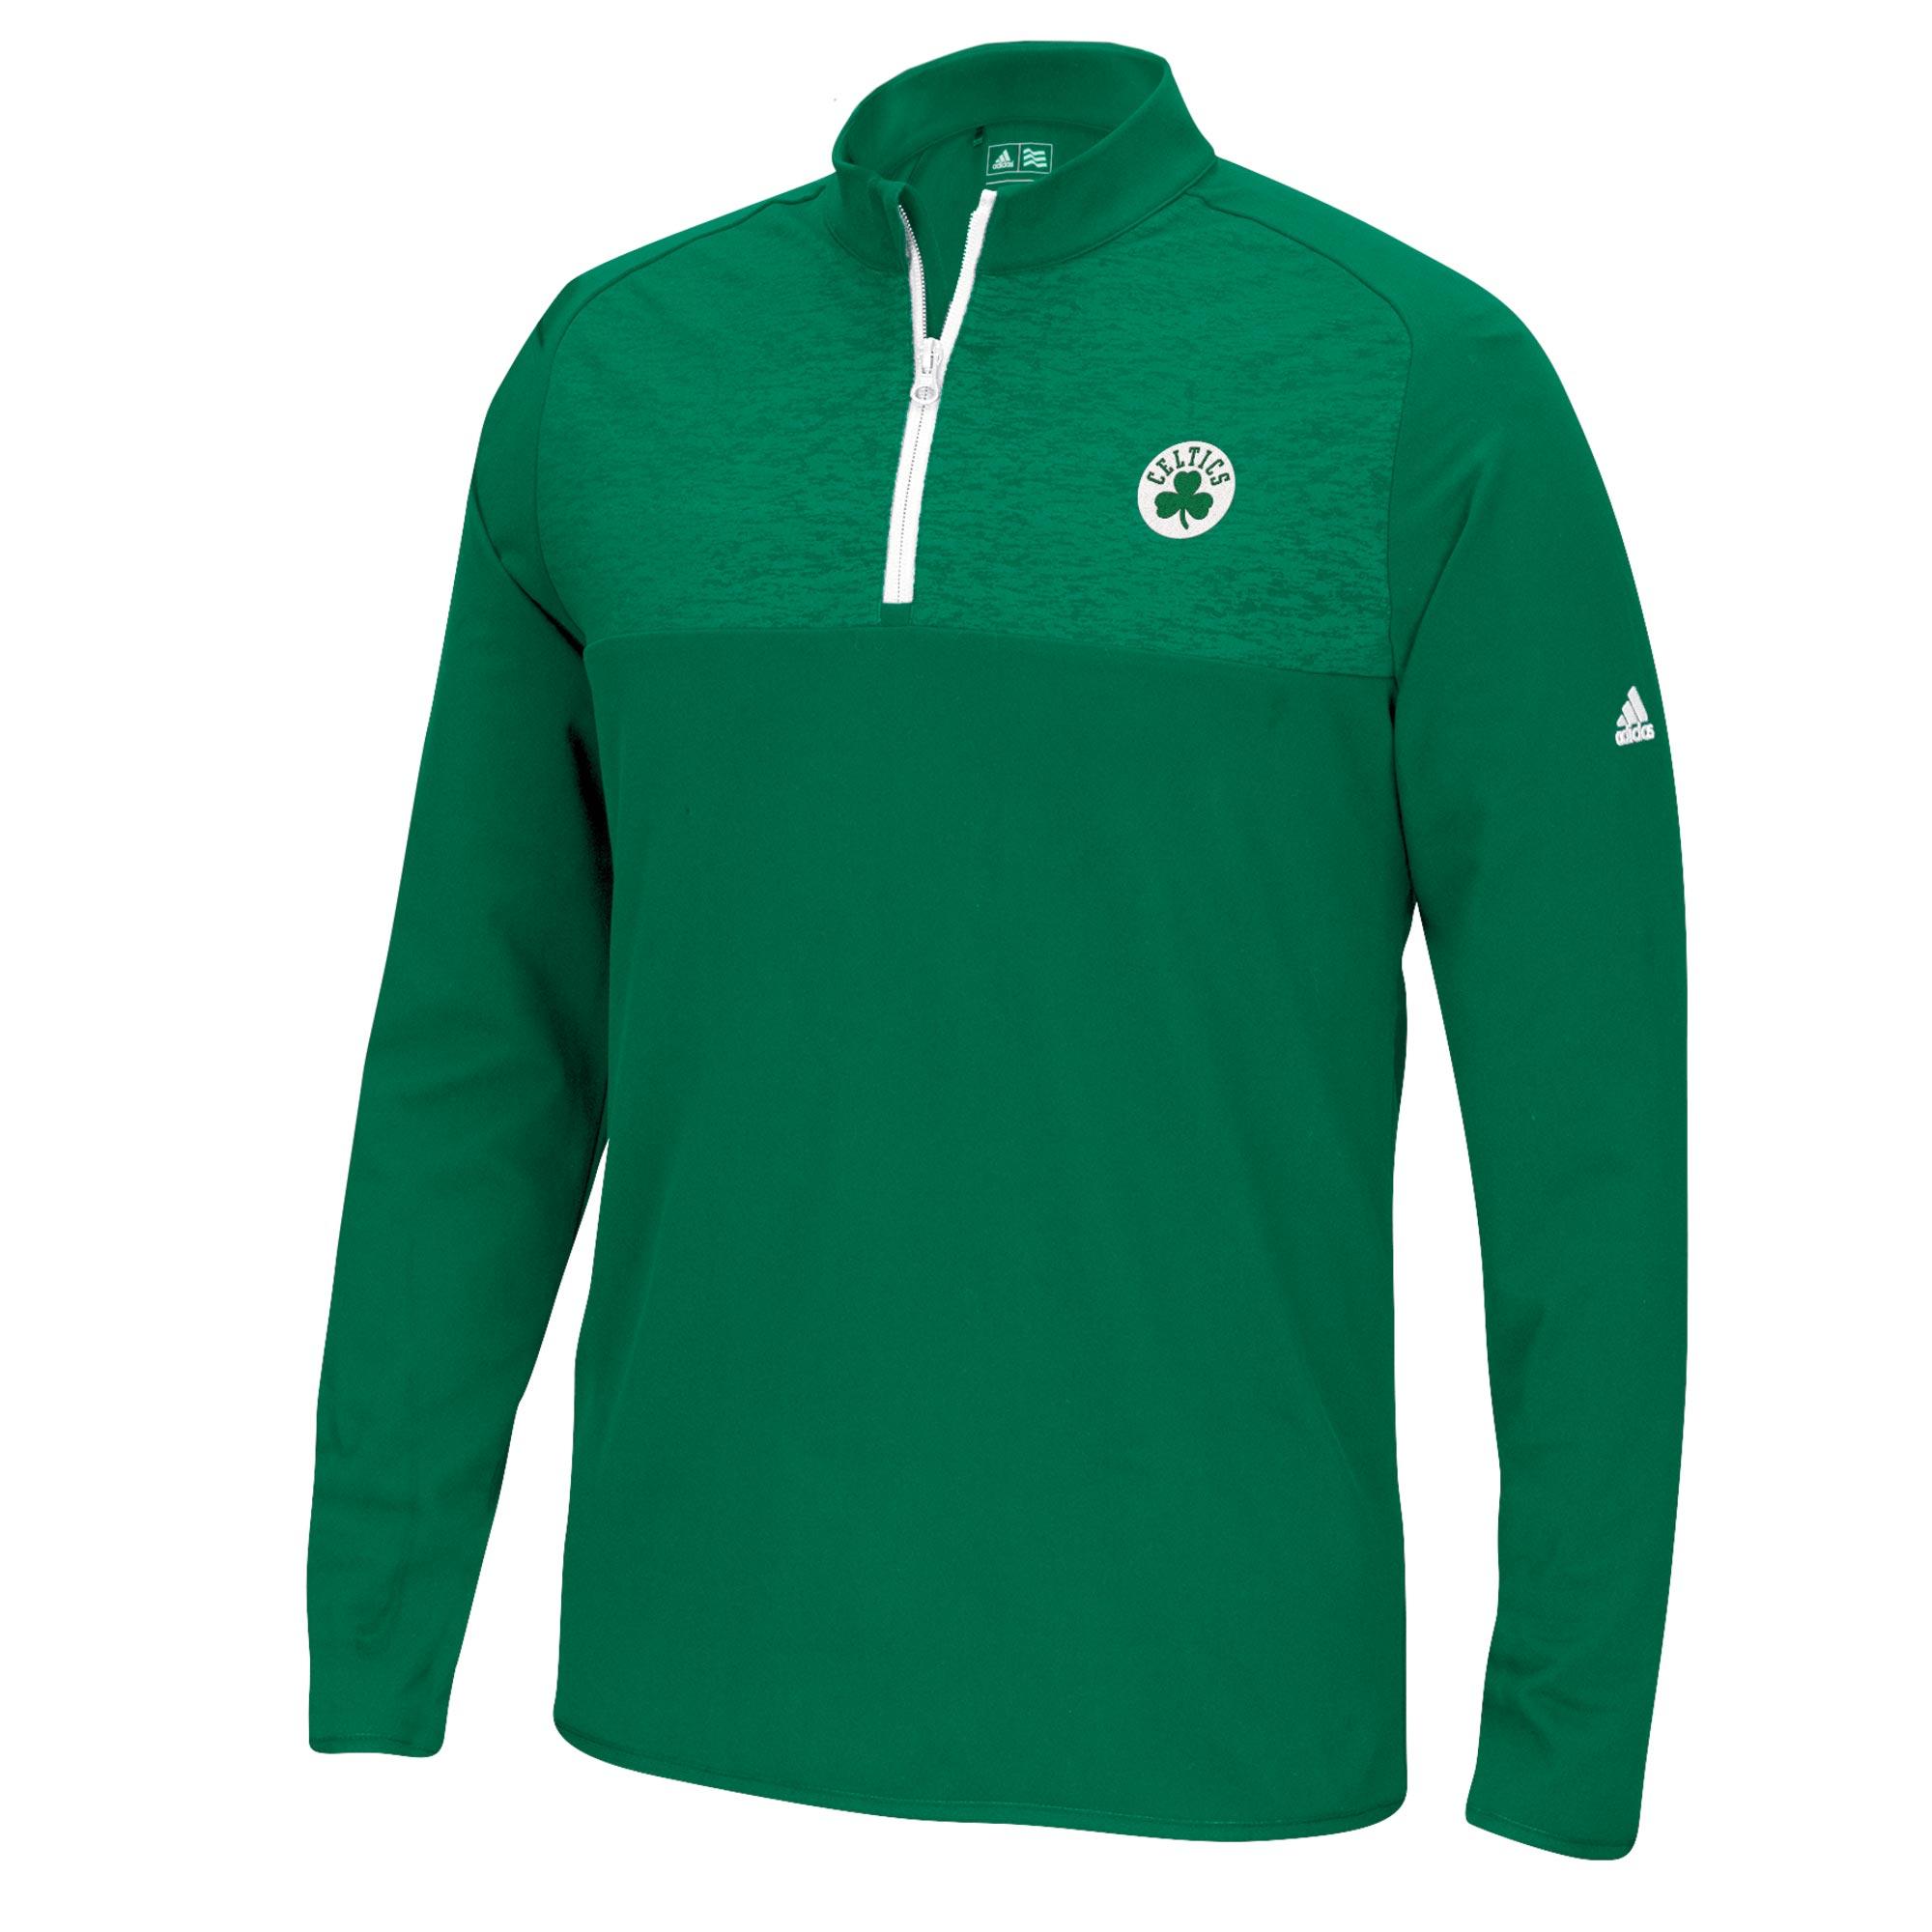 Boston Celtics adidas Climawarm 1/4 Jacket - Mens